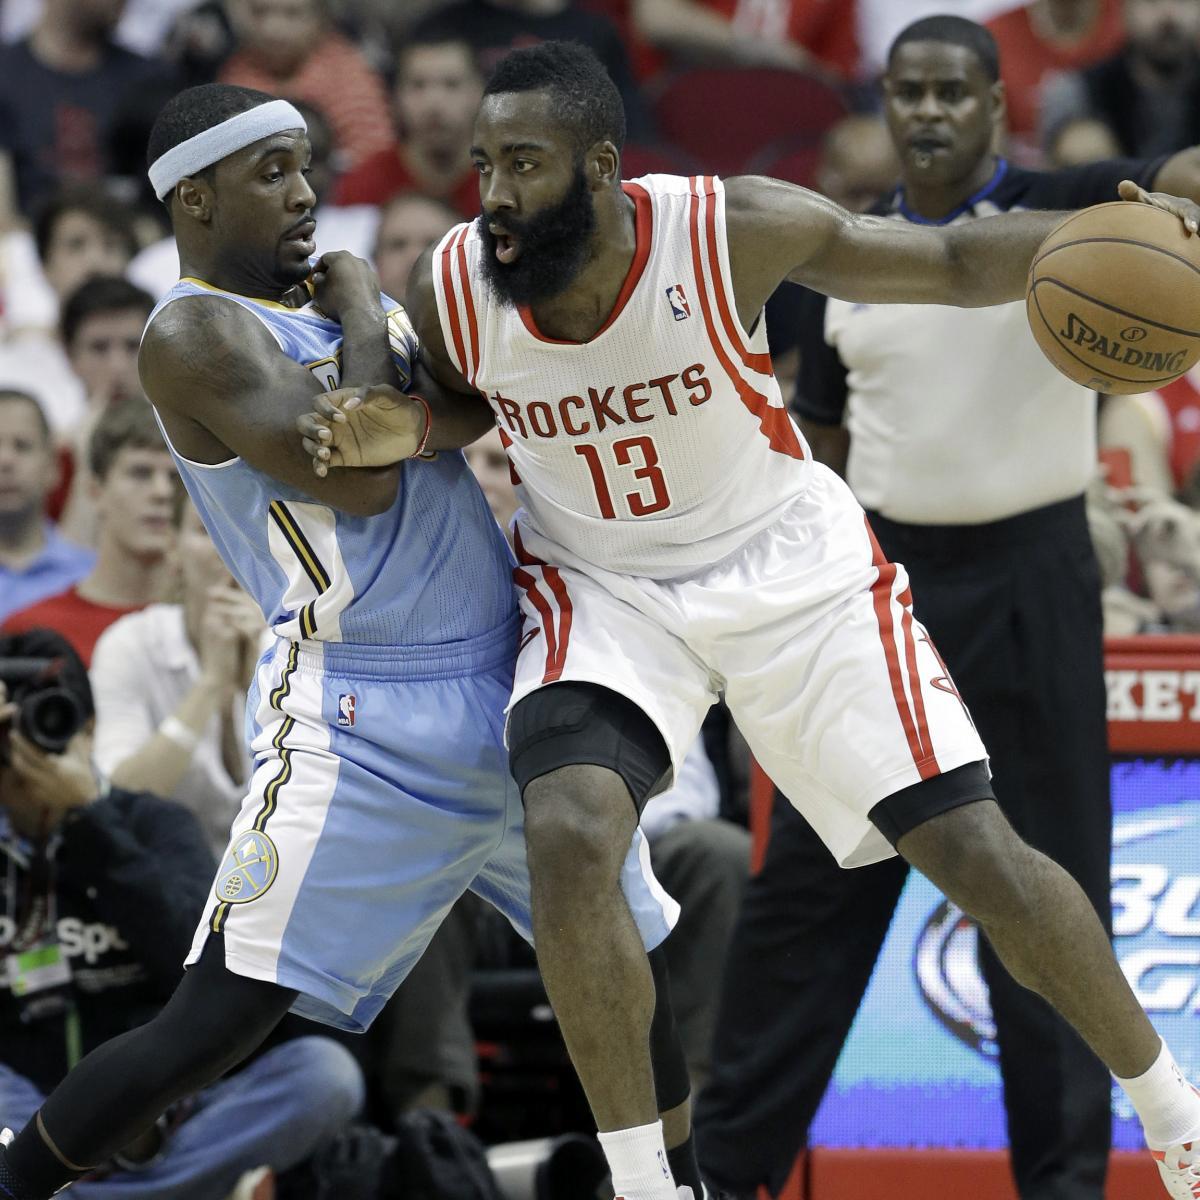 Houston Rockets Vs Denver Nuggets: Denver Nuggets Vs. Houston Rockets: Live Score And